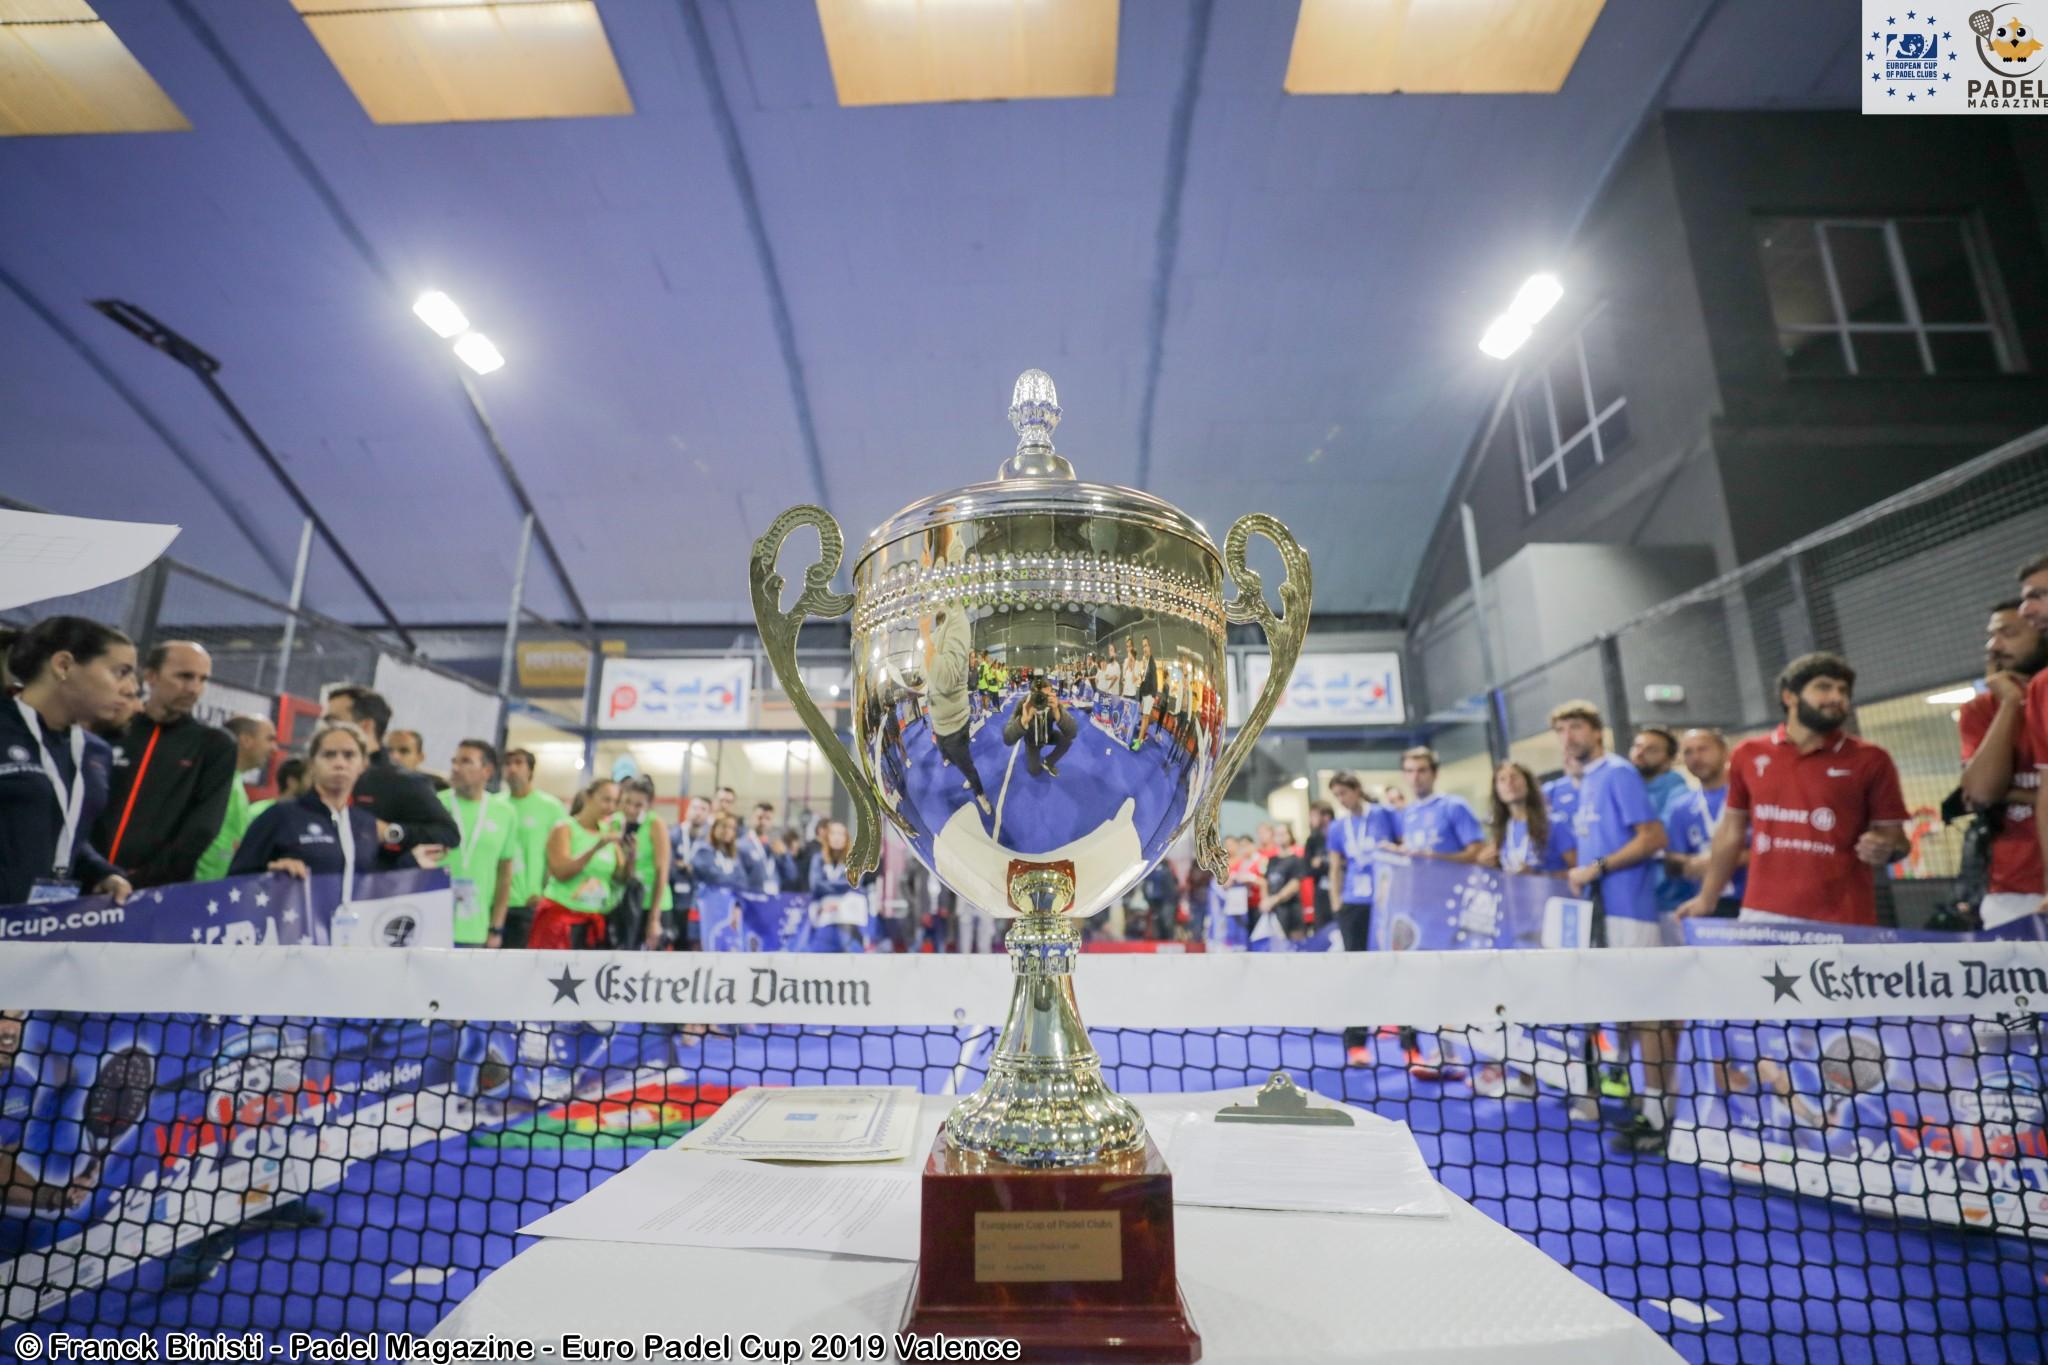 coupe europe padel|Cuadro de juego A|Cuadro de juego B|Cuadro de juego C|Cuadro de juego D|coupe euro padel cup 2019|coupe trophée euro padel cup 2019|euro padel cup 2019 valence